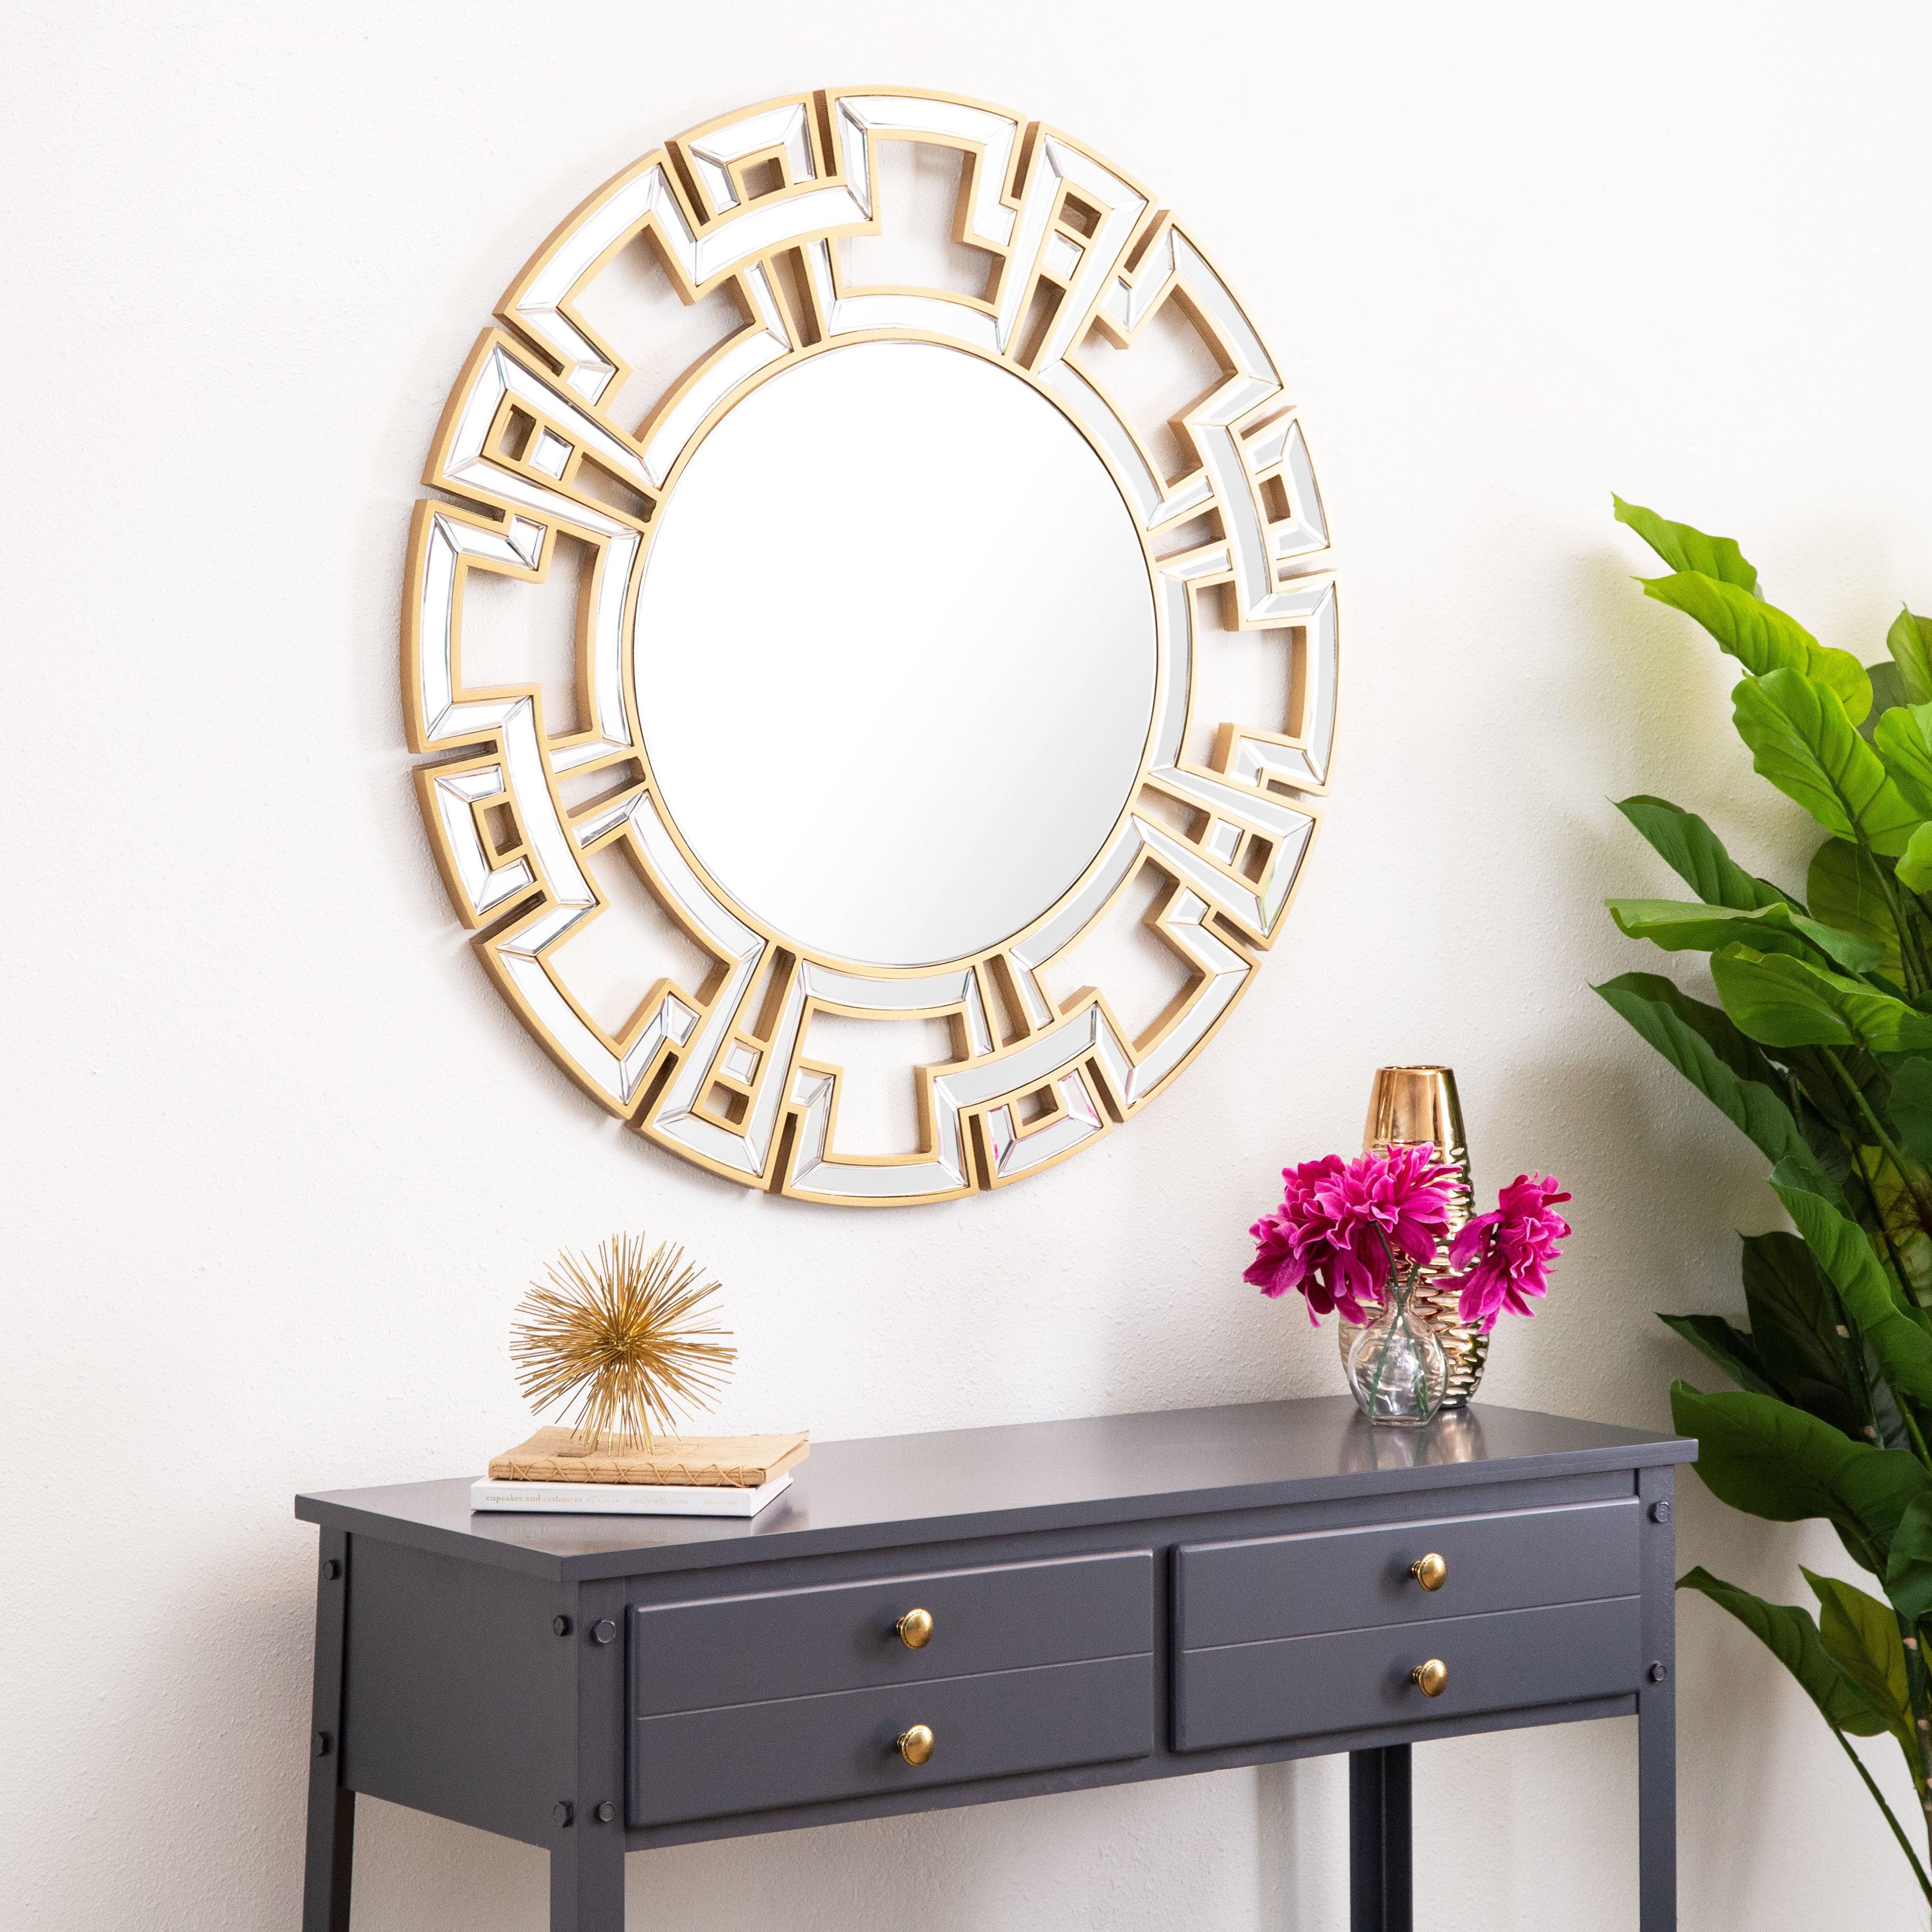 Tata Openwork Round Wall Mirror Regarding Caja Rectangle Glass Frame Wall Mirrors (View 26 of 30)